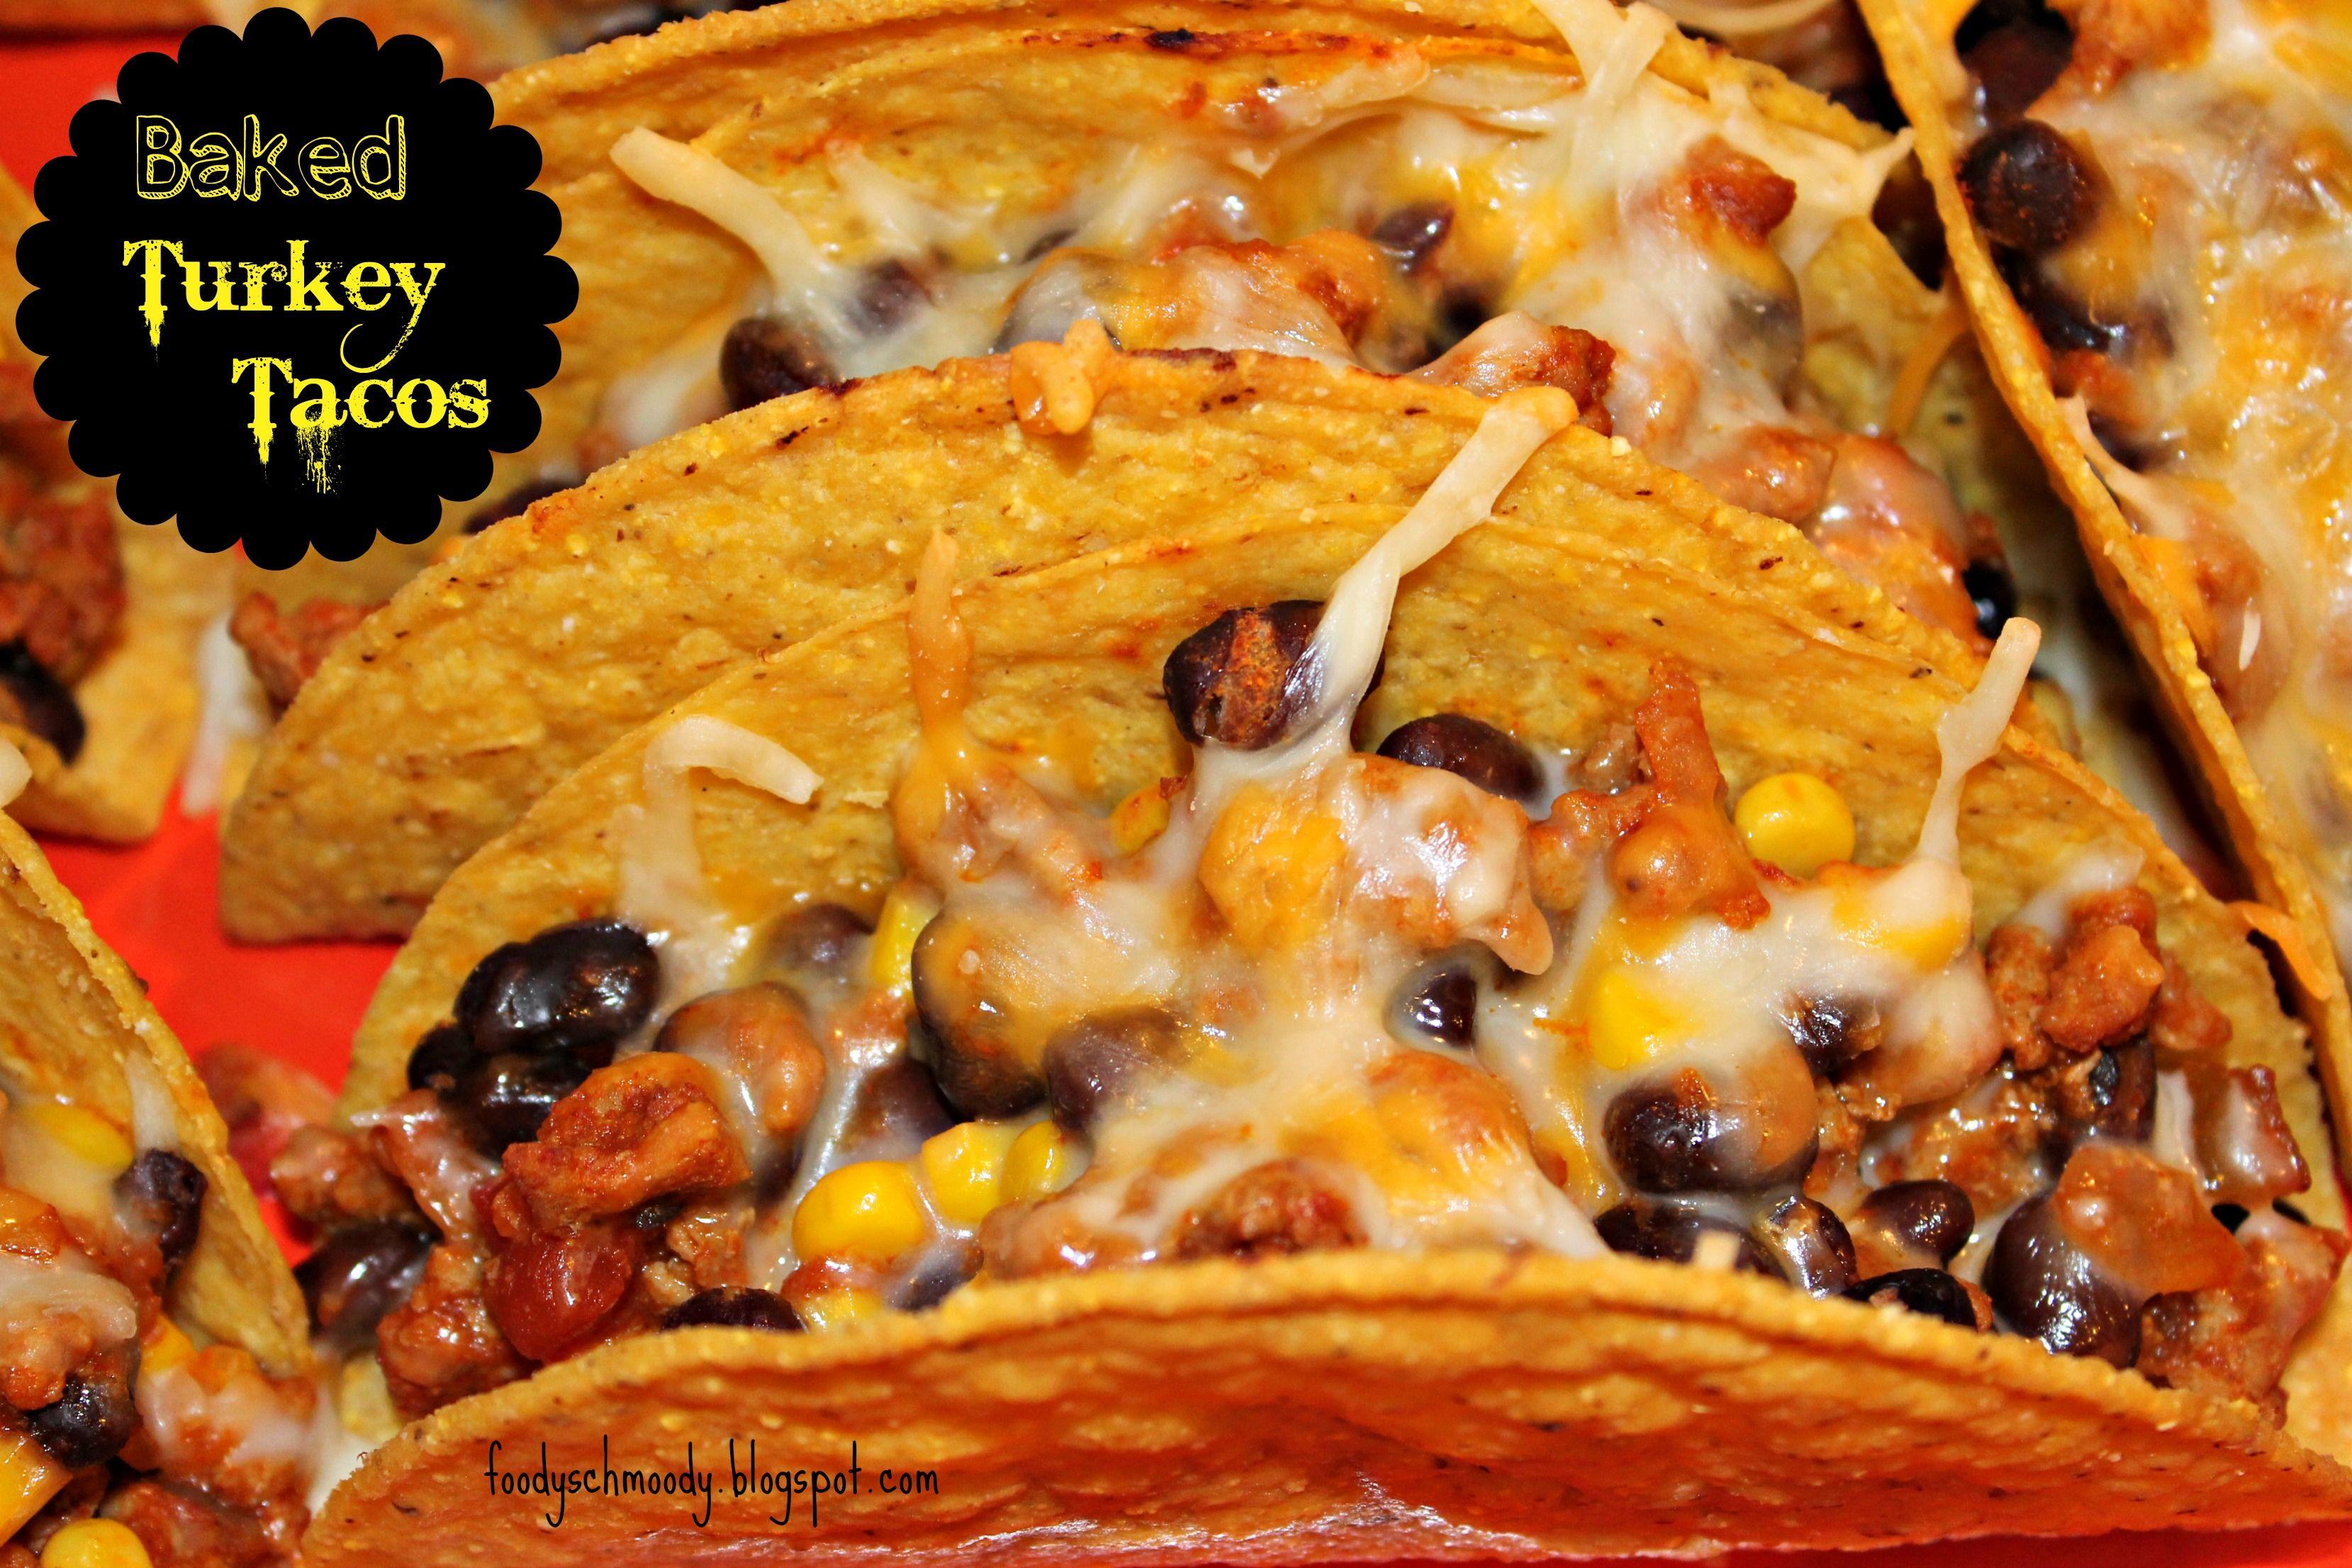 Oven Baked Turkey Tacos on MyRecipeMagic.com